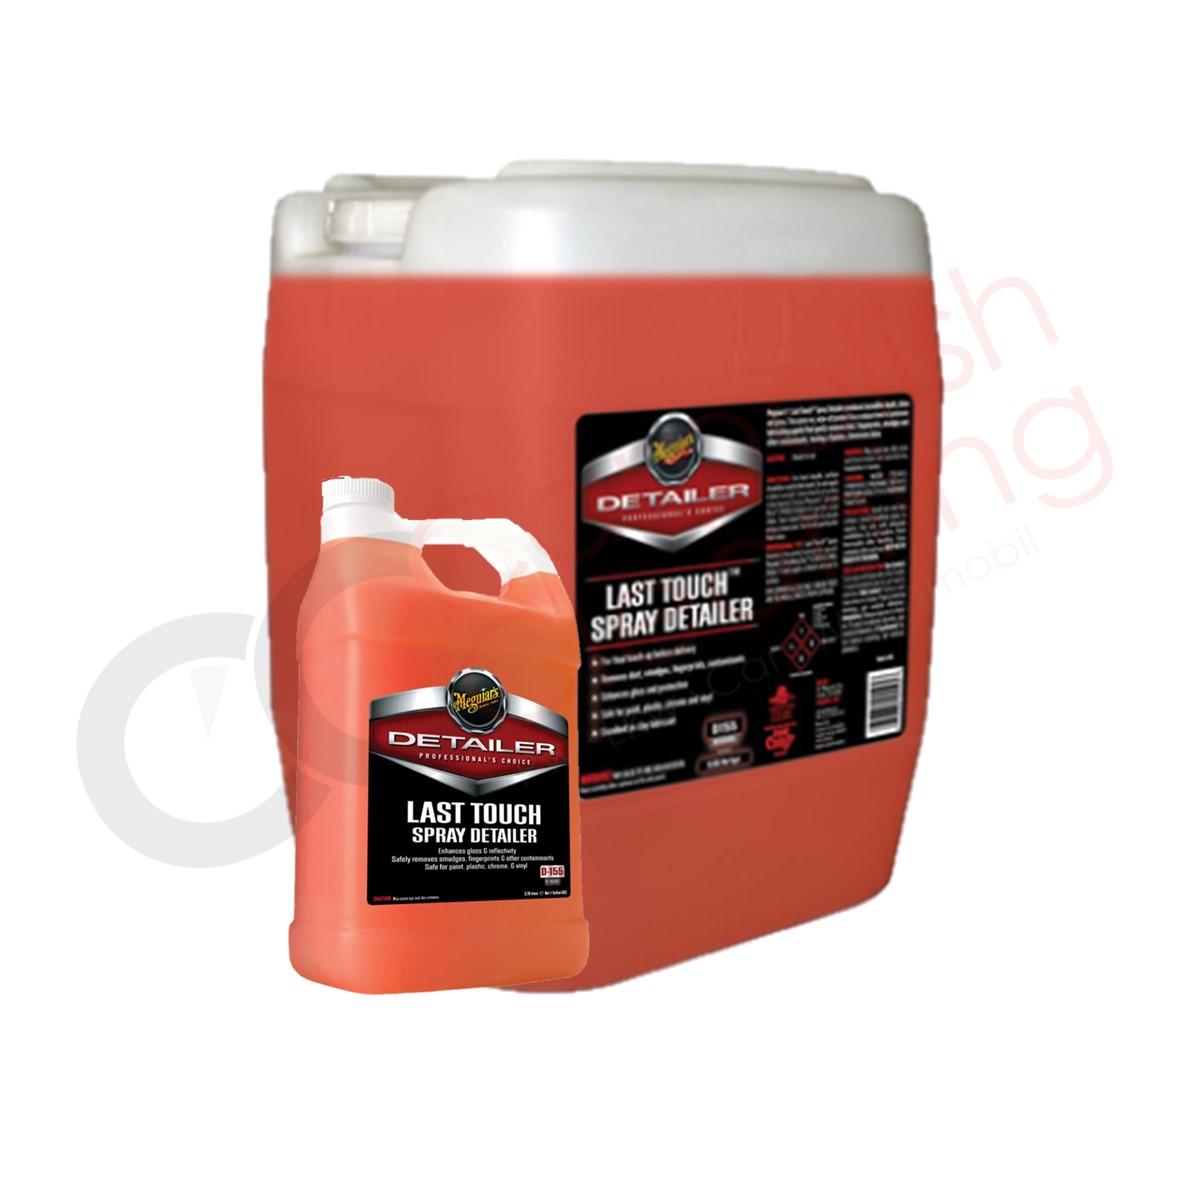 Meguiars Last Touch Spray Detailer